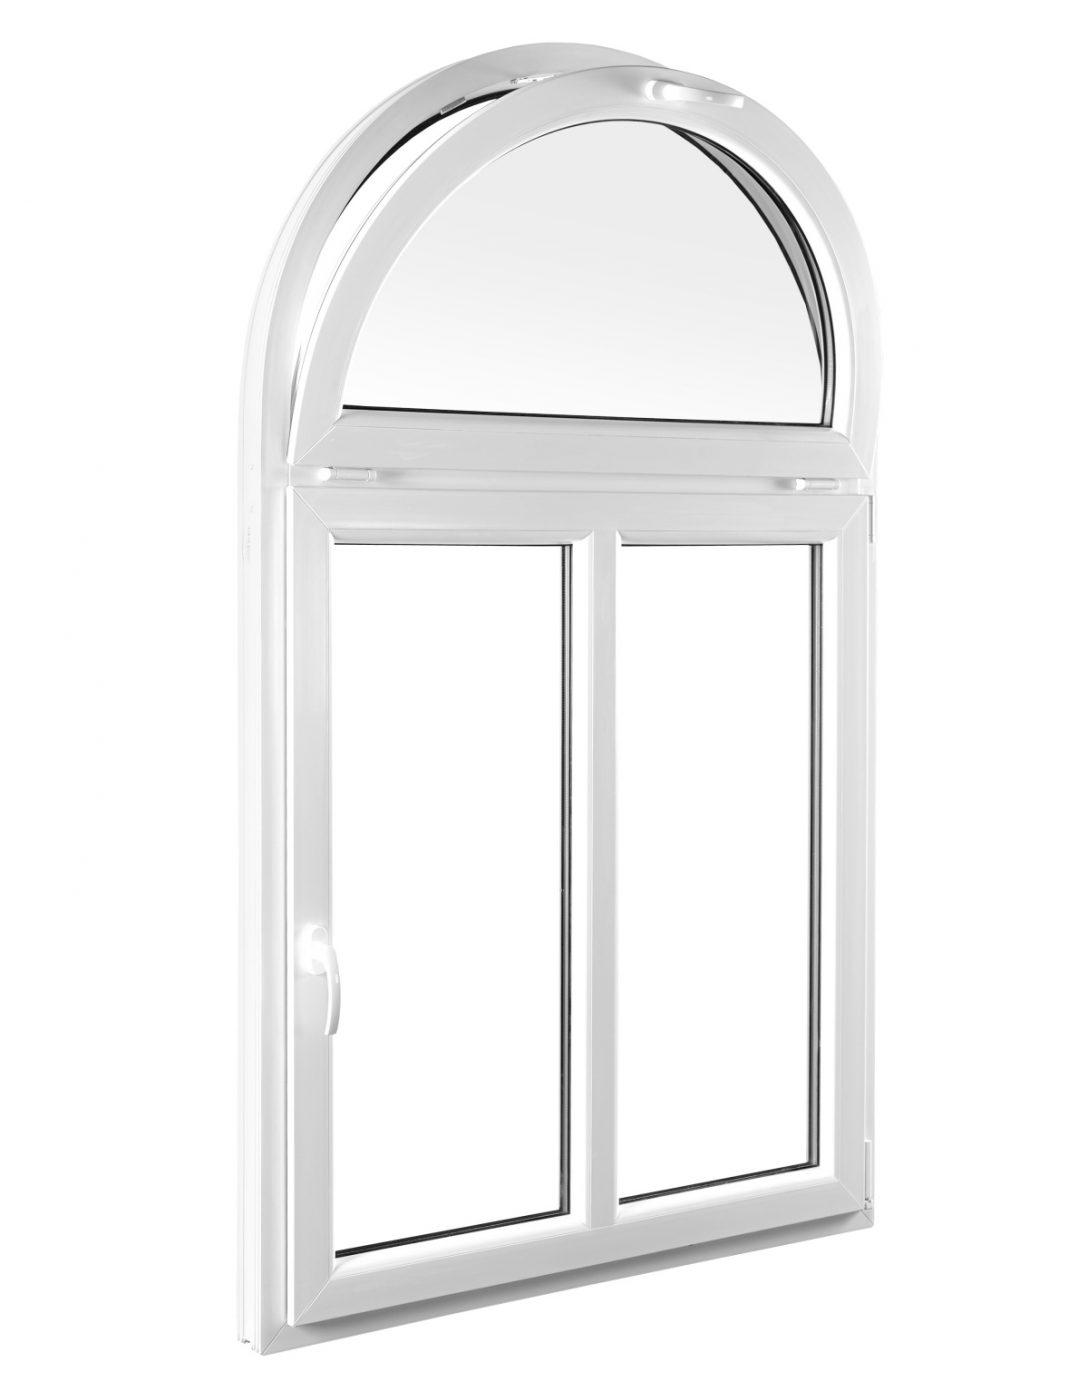 Large Size of Holz Alu Fenster Preise Pro M2 Aluminium Preis Leistung Unilux Preisliste Preisunterschied Erfahrungen Kosten Qm Preisvergleich Online Holz Alu Pvc Günstig Fenster Holz Alu Fenster Preise